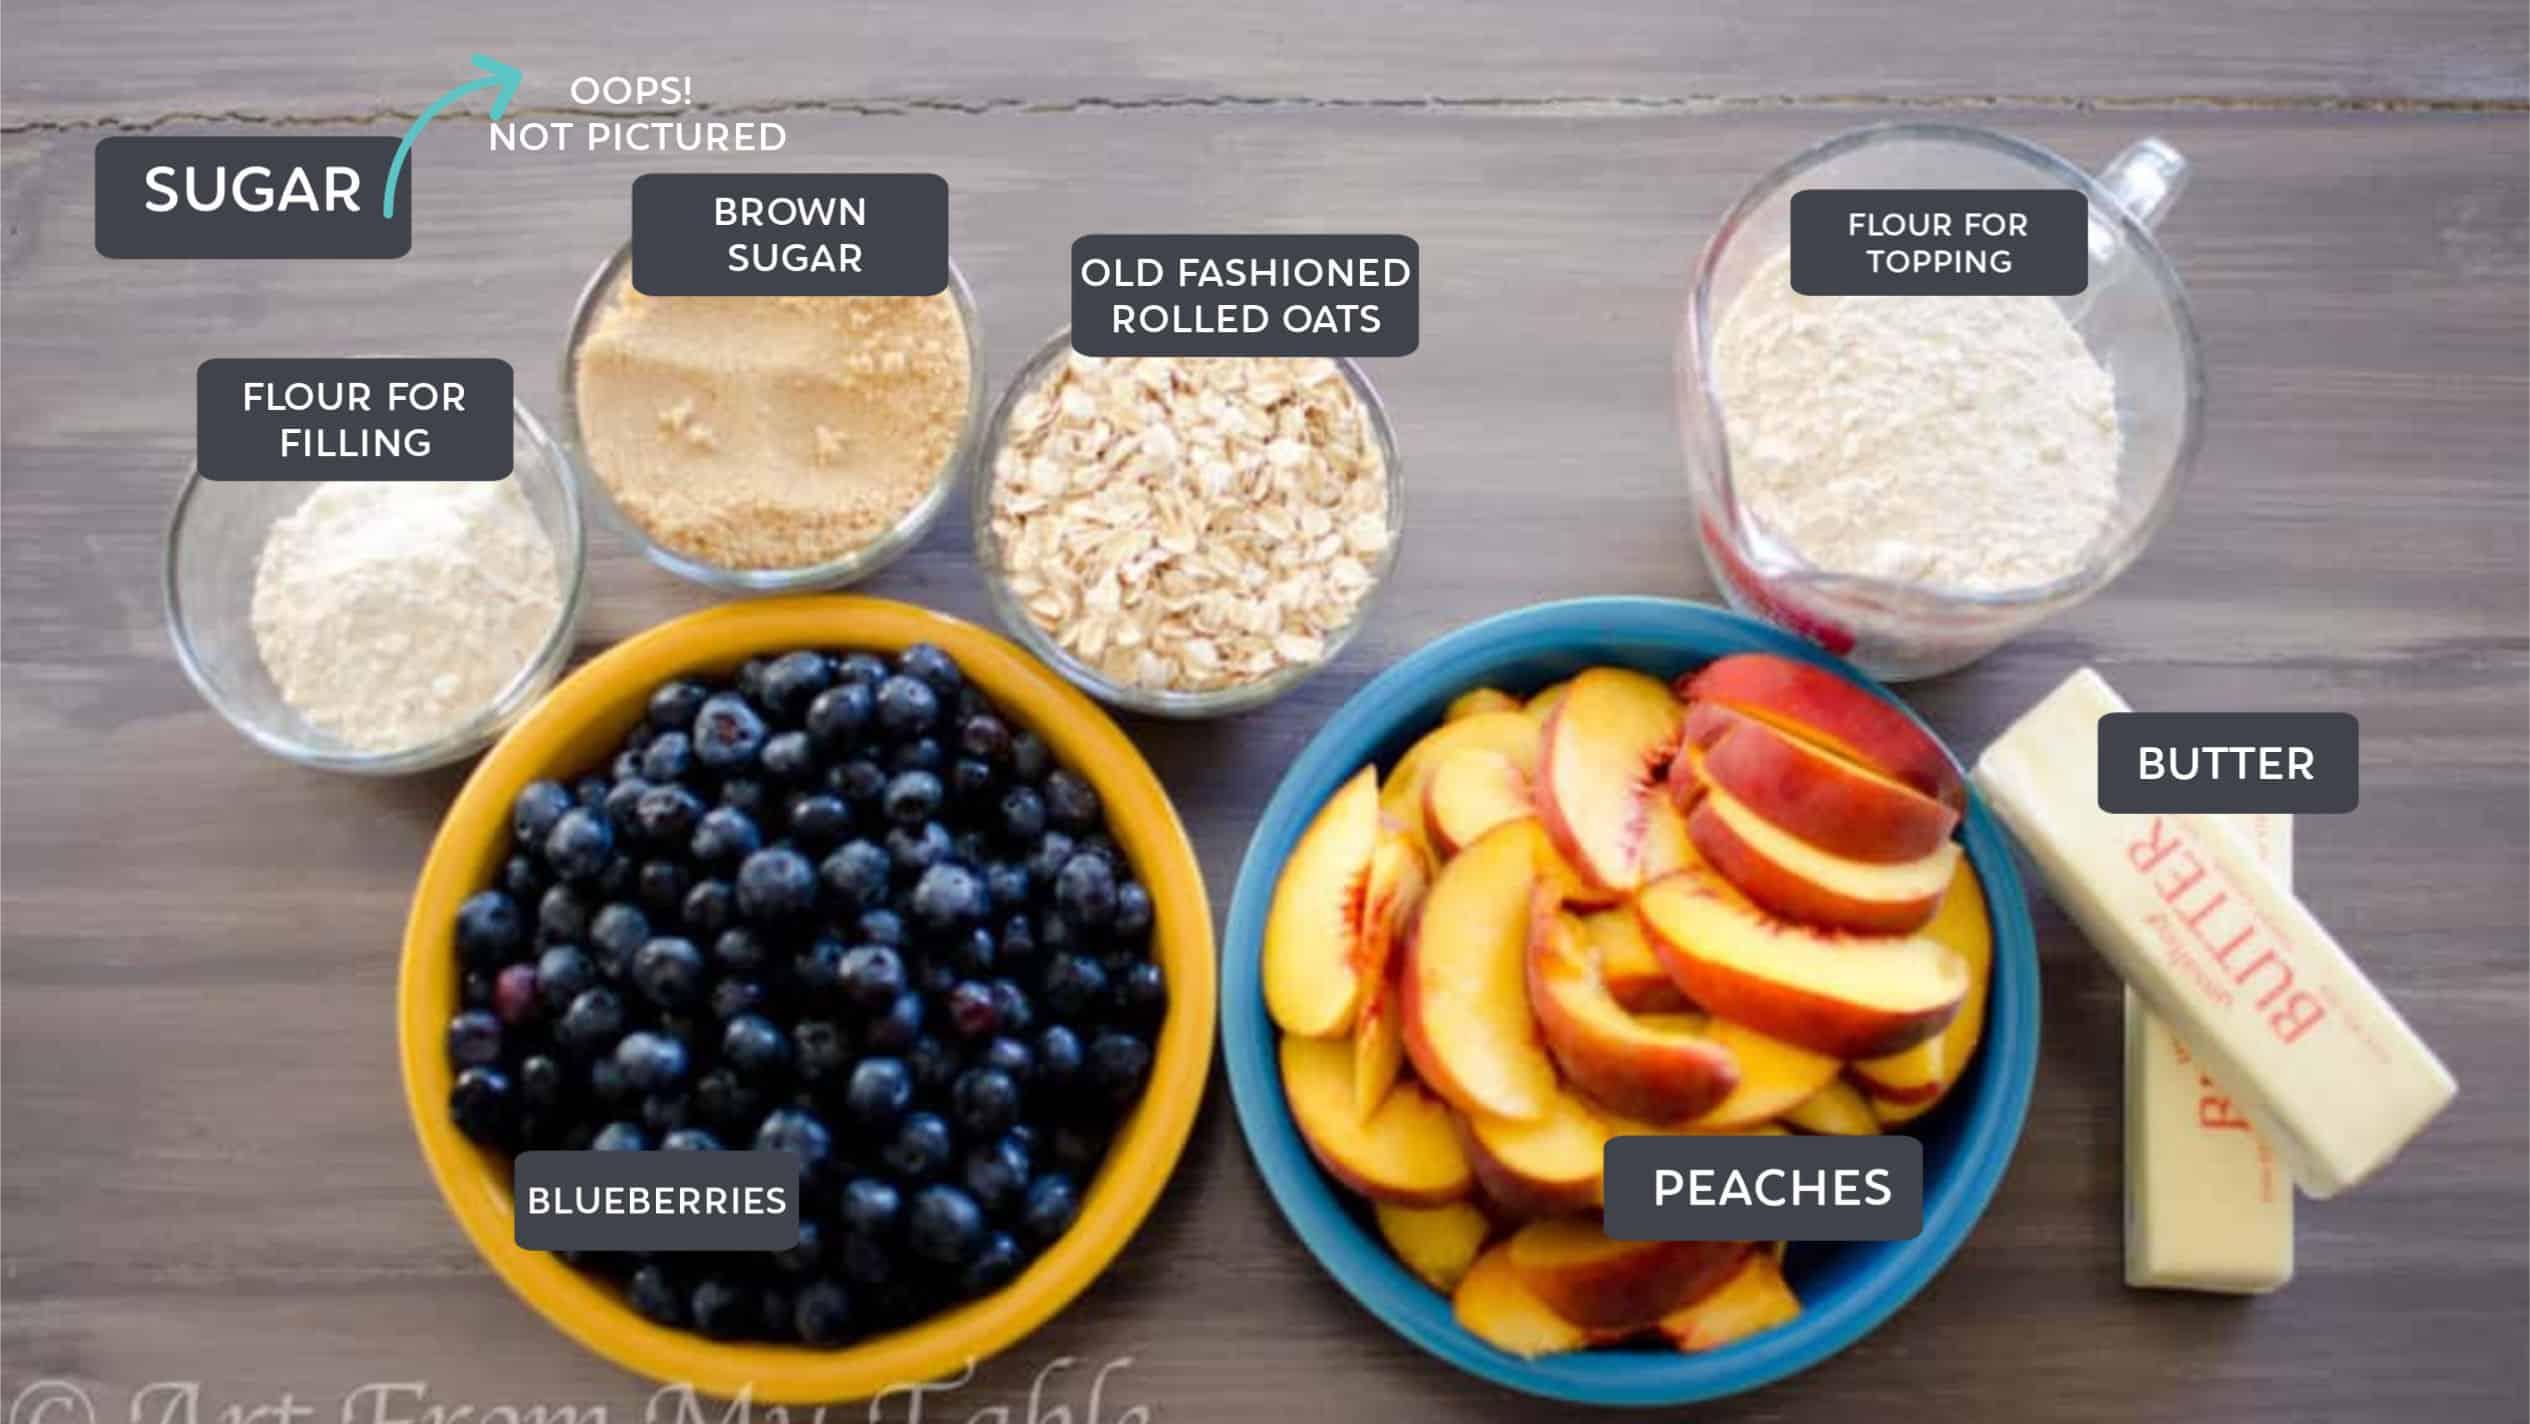 ingredients for blueberry peach crisp: blueberries, peaches, butter, flour, oats, brown sugar.